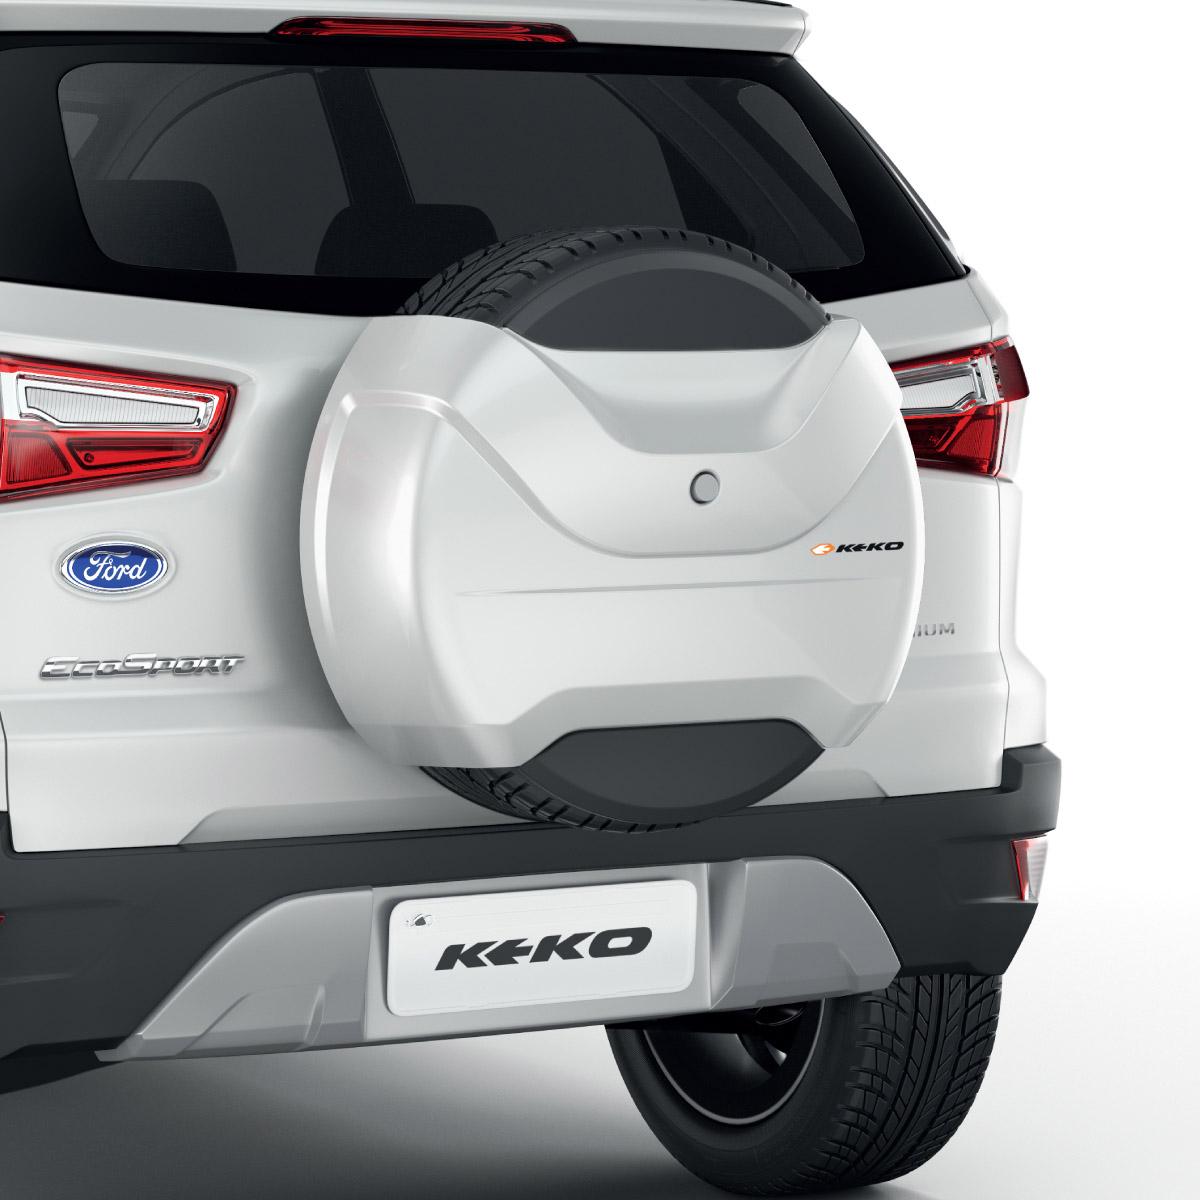 Capa de estepe r�gida Keko Novo Ecosport 2013 a 2017 cor Branco �rtico